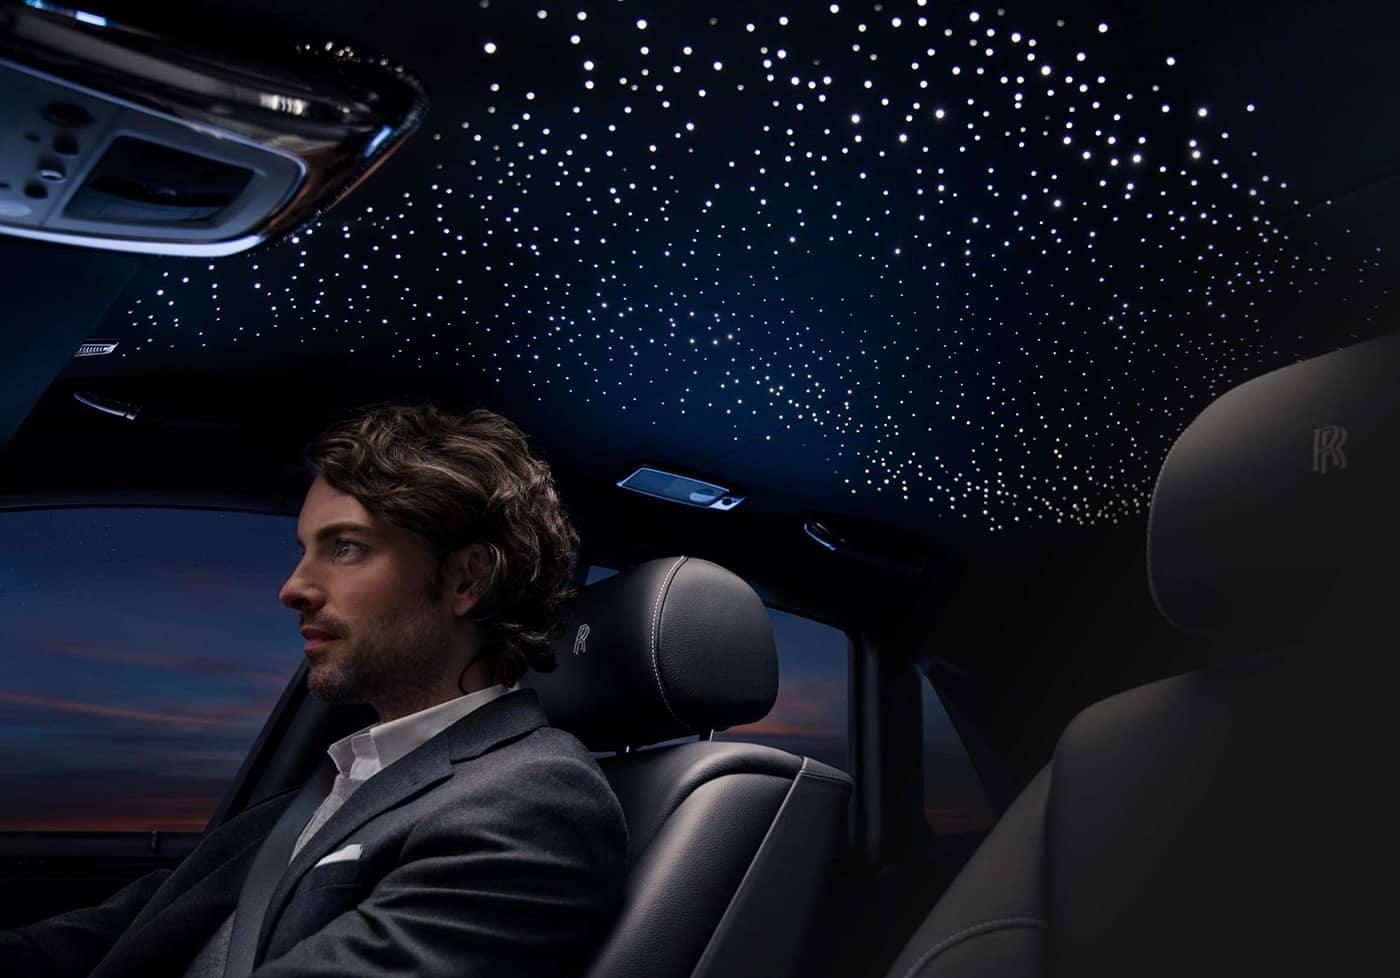 2020 Rolls Royce Ghost Interior